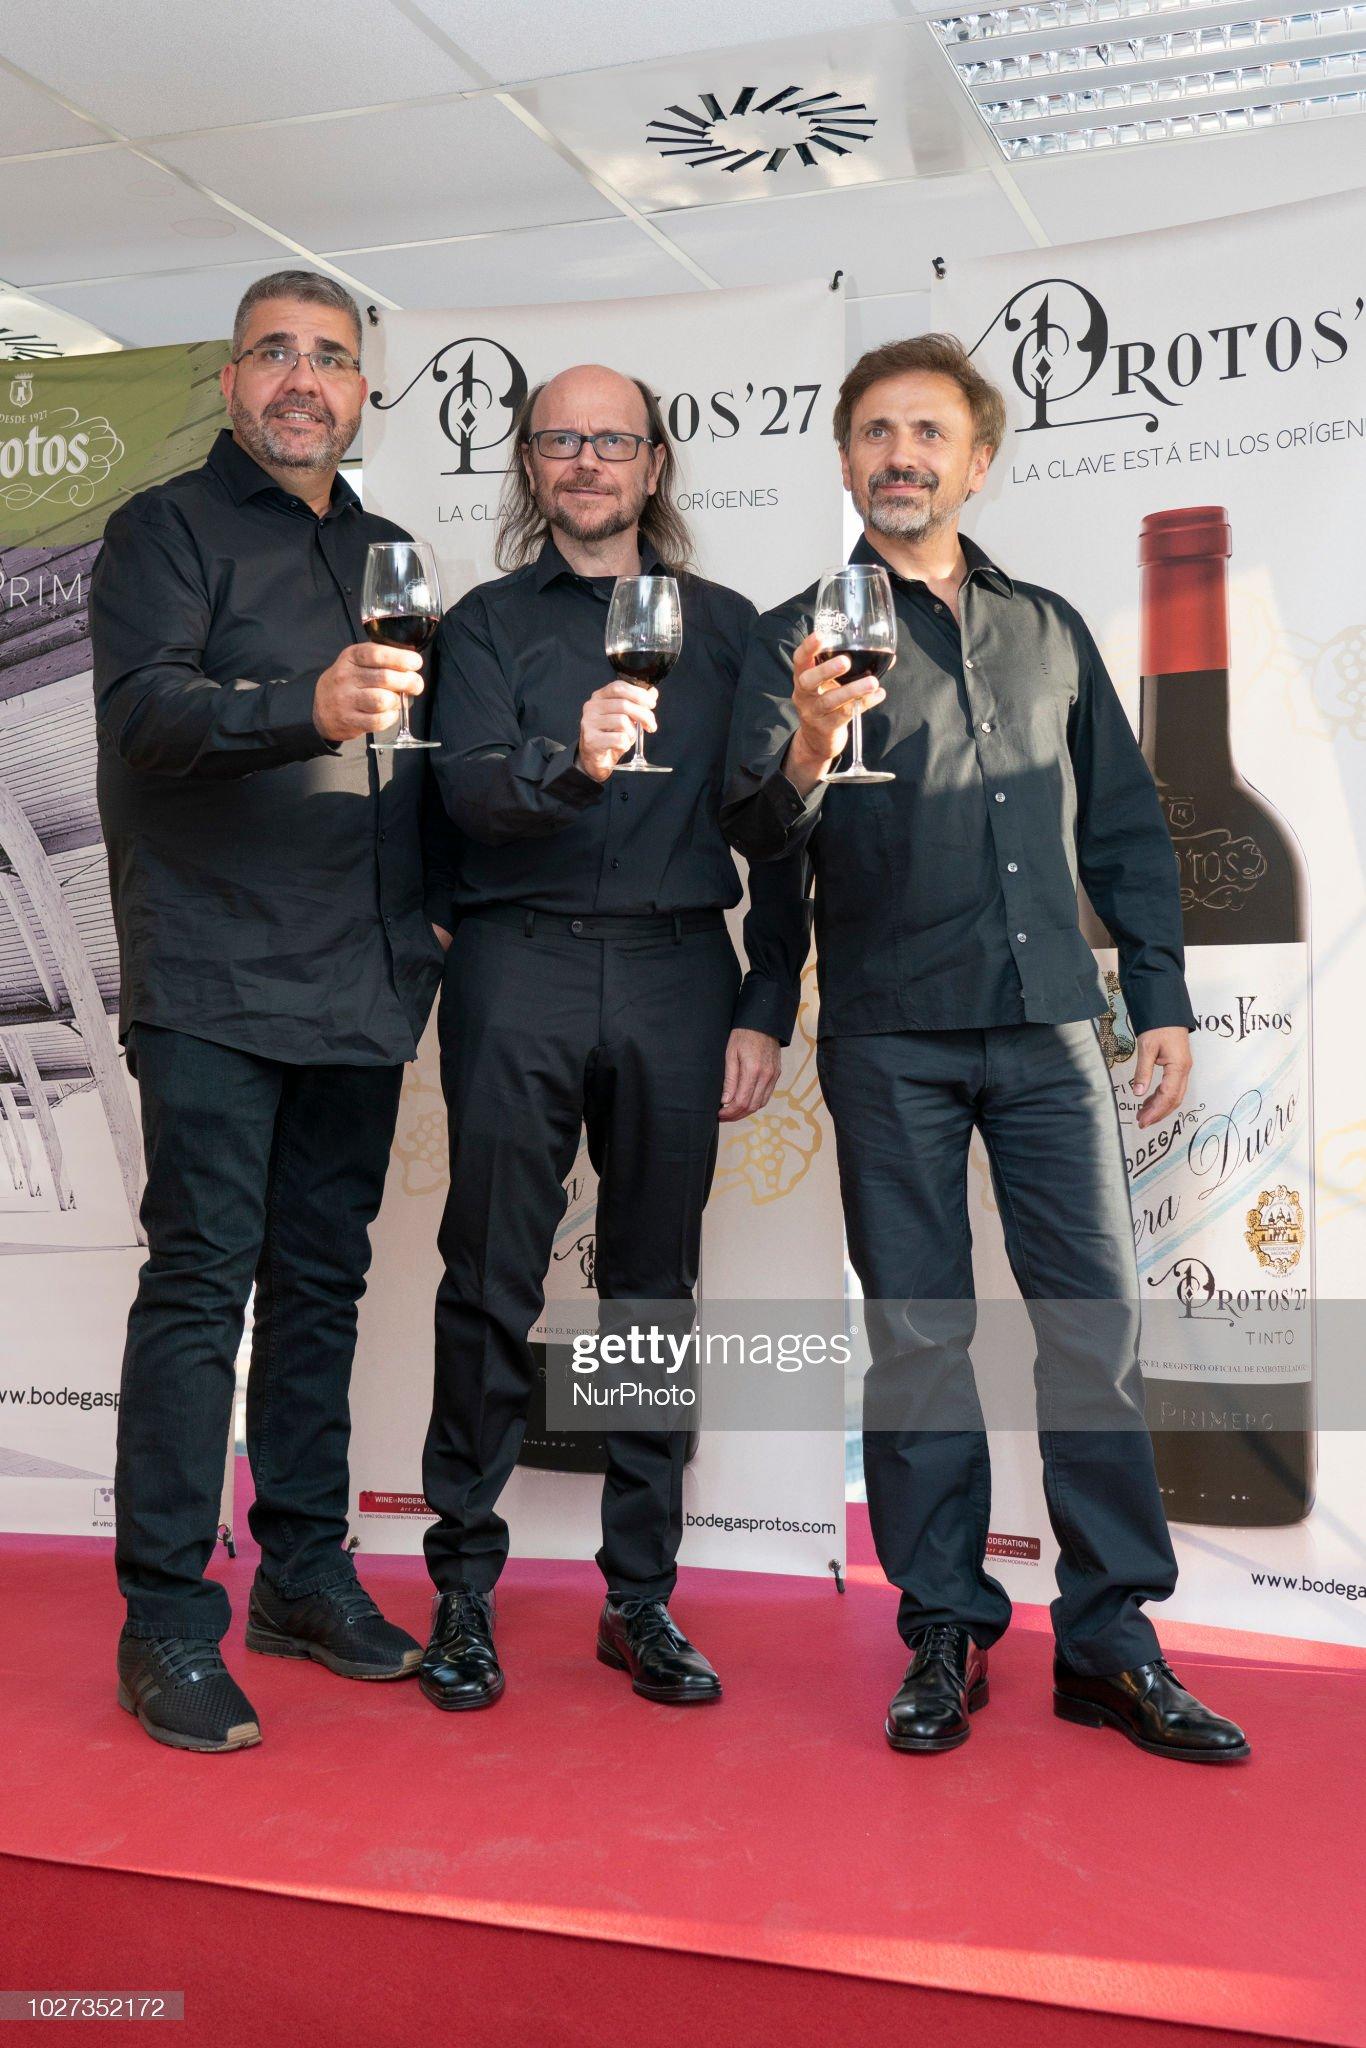 ¿Cuánto mide Florentino Fernández? - Altura Actors-florentino-fernandez-santiago-segura-and-jose-mota-attend-the-picture-id1027352172?s=2048x2048